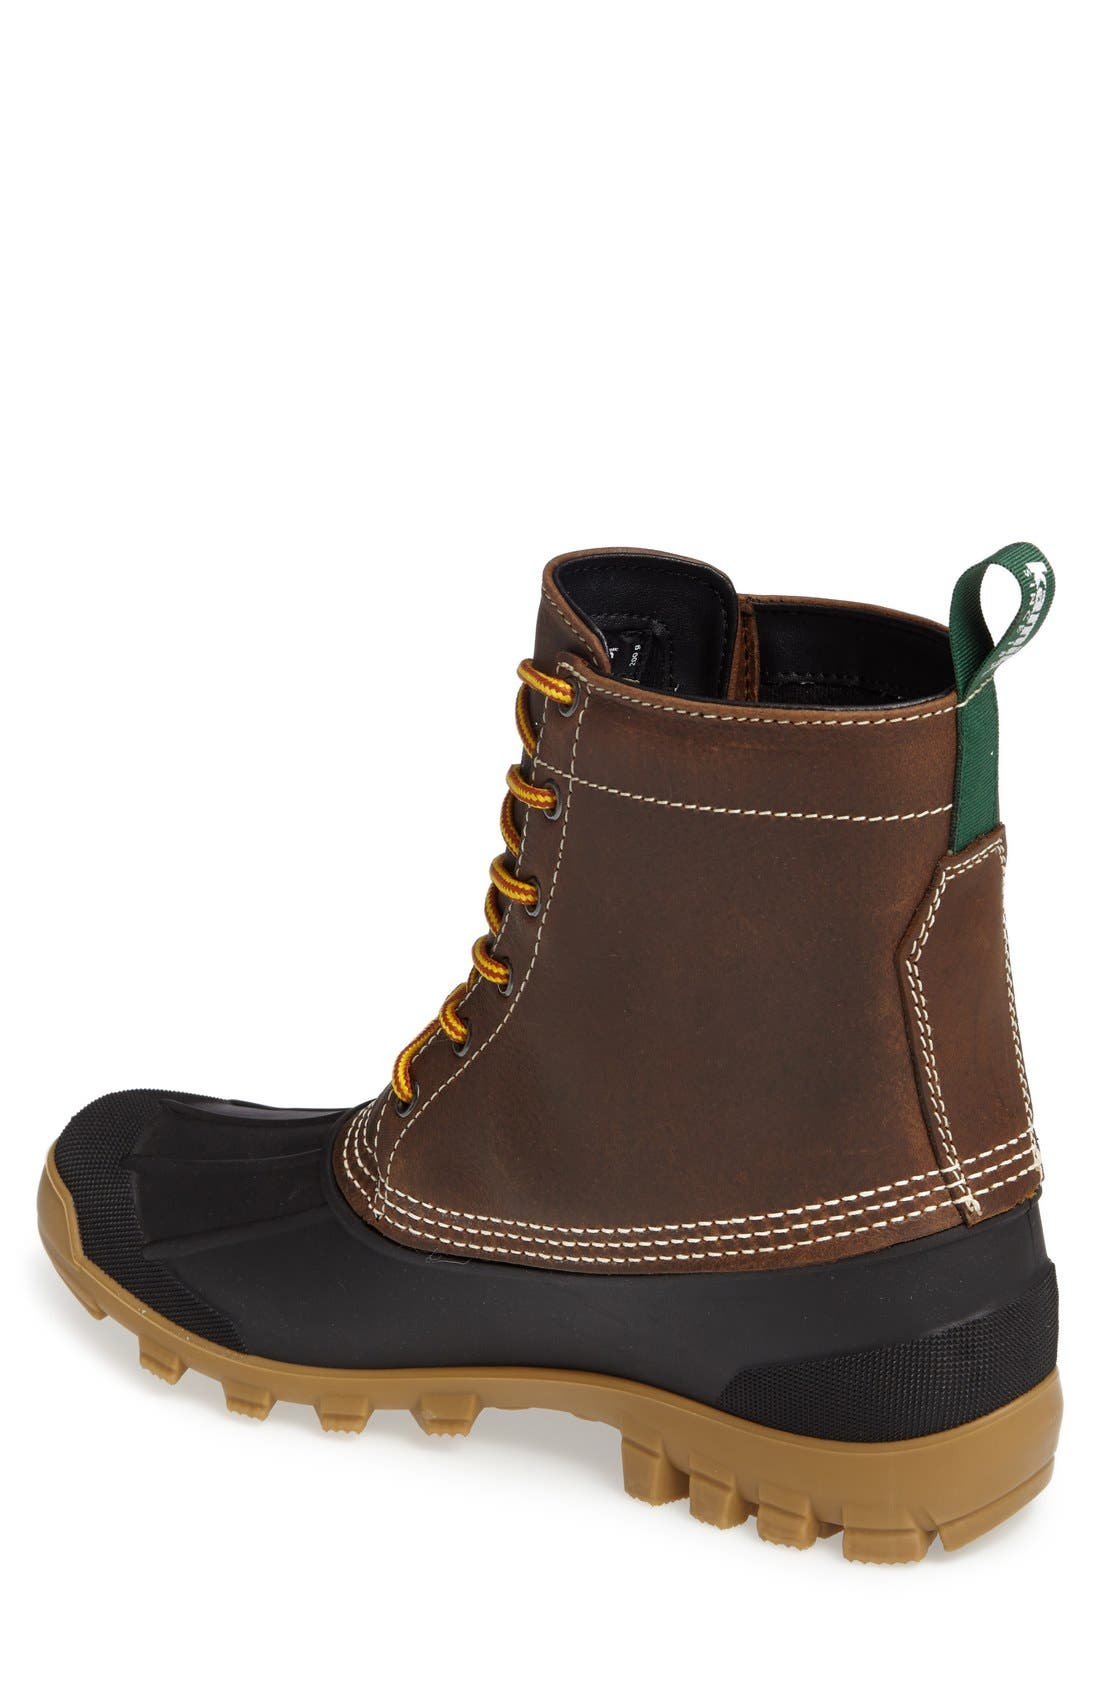 Yukon6 Waterproof Work Boot,                             Alternate thumbnail 2, color,                             Dark Brown Leather